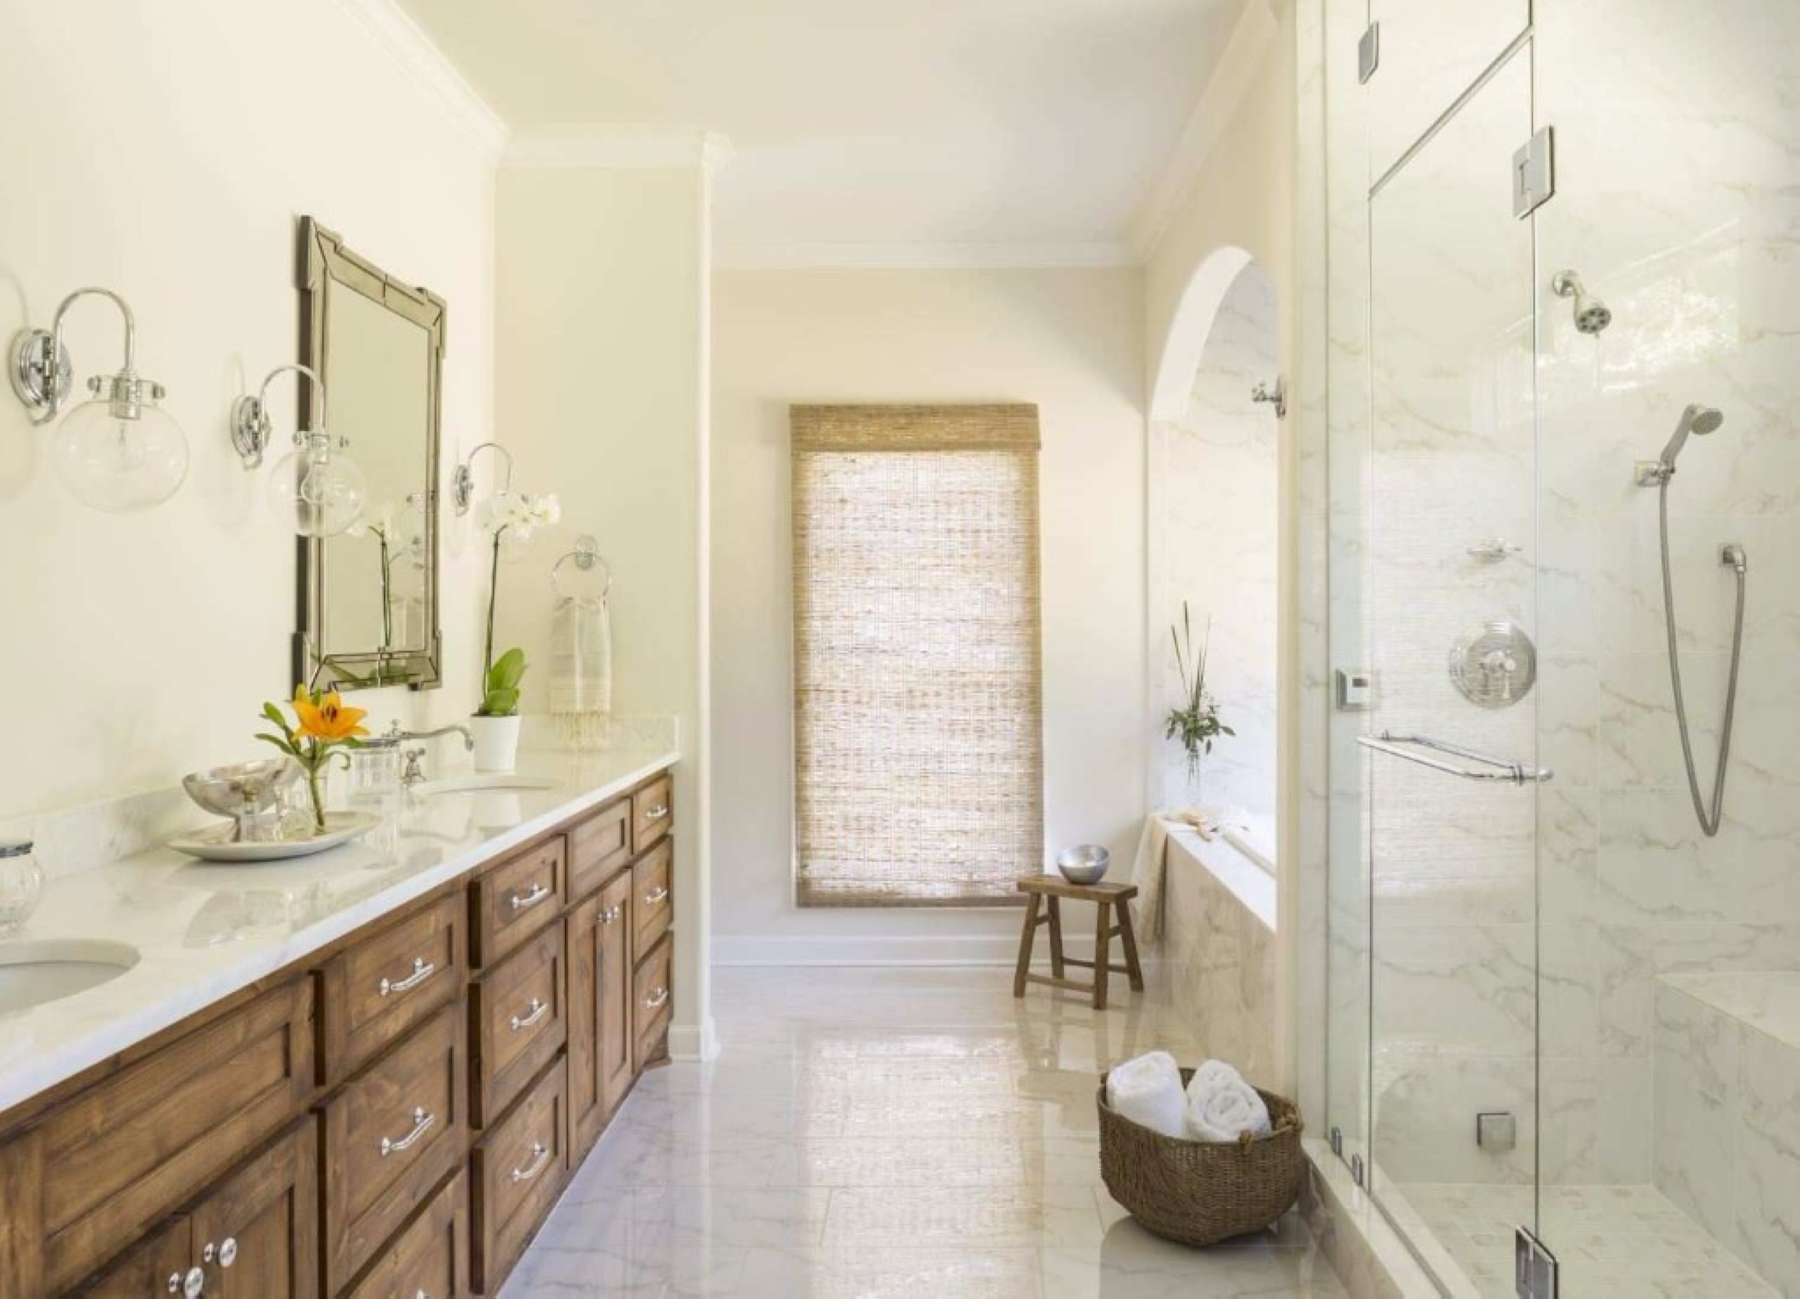 Arkansas-interior-design-Southern-Comfort-k-lewis-interior-design-IMG_009